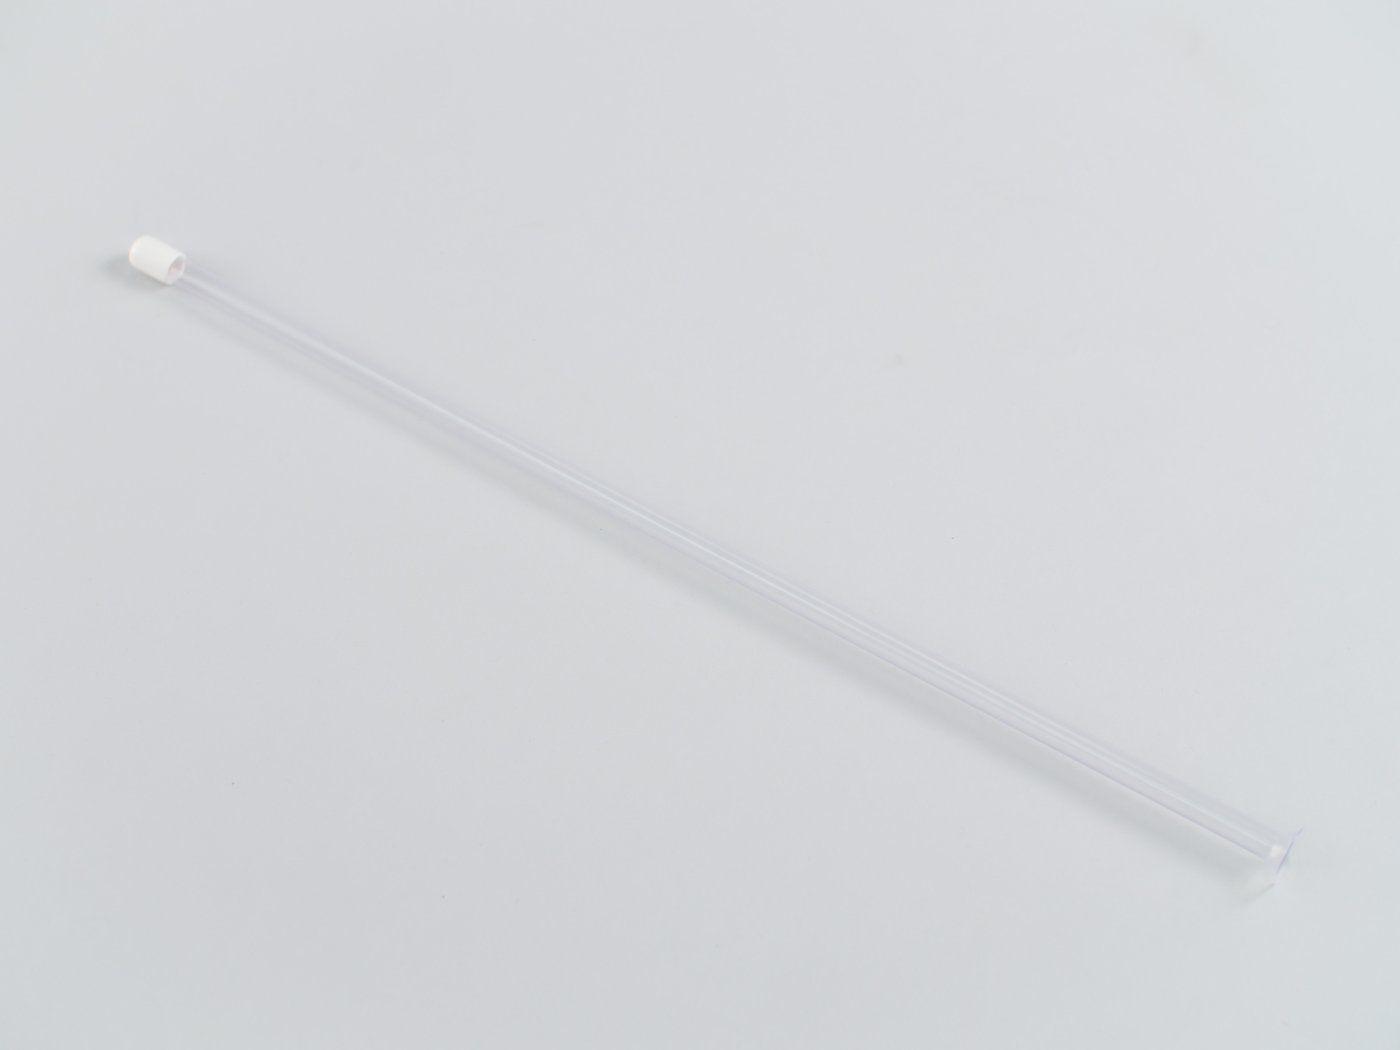 40047 agtech sani schield rod protectors per 25 st b74725